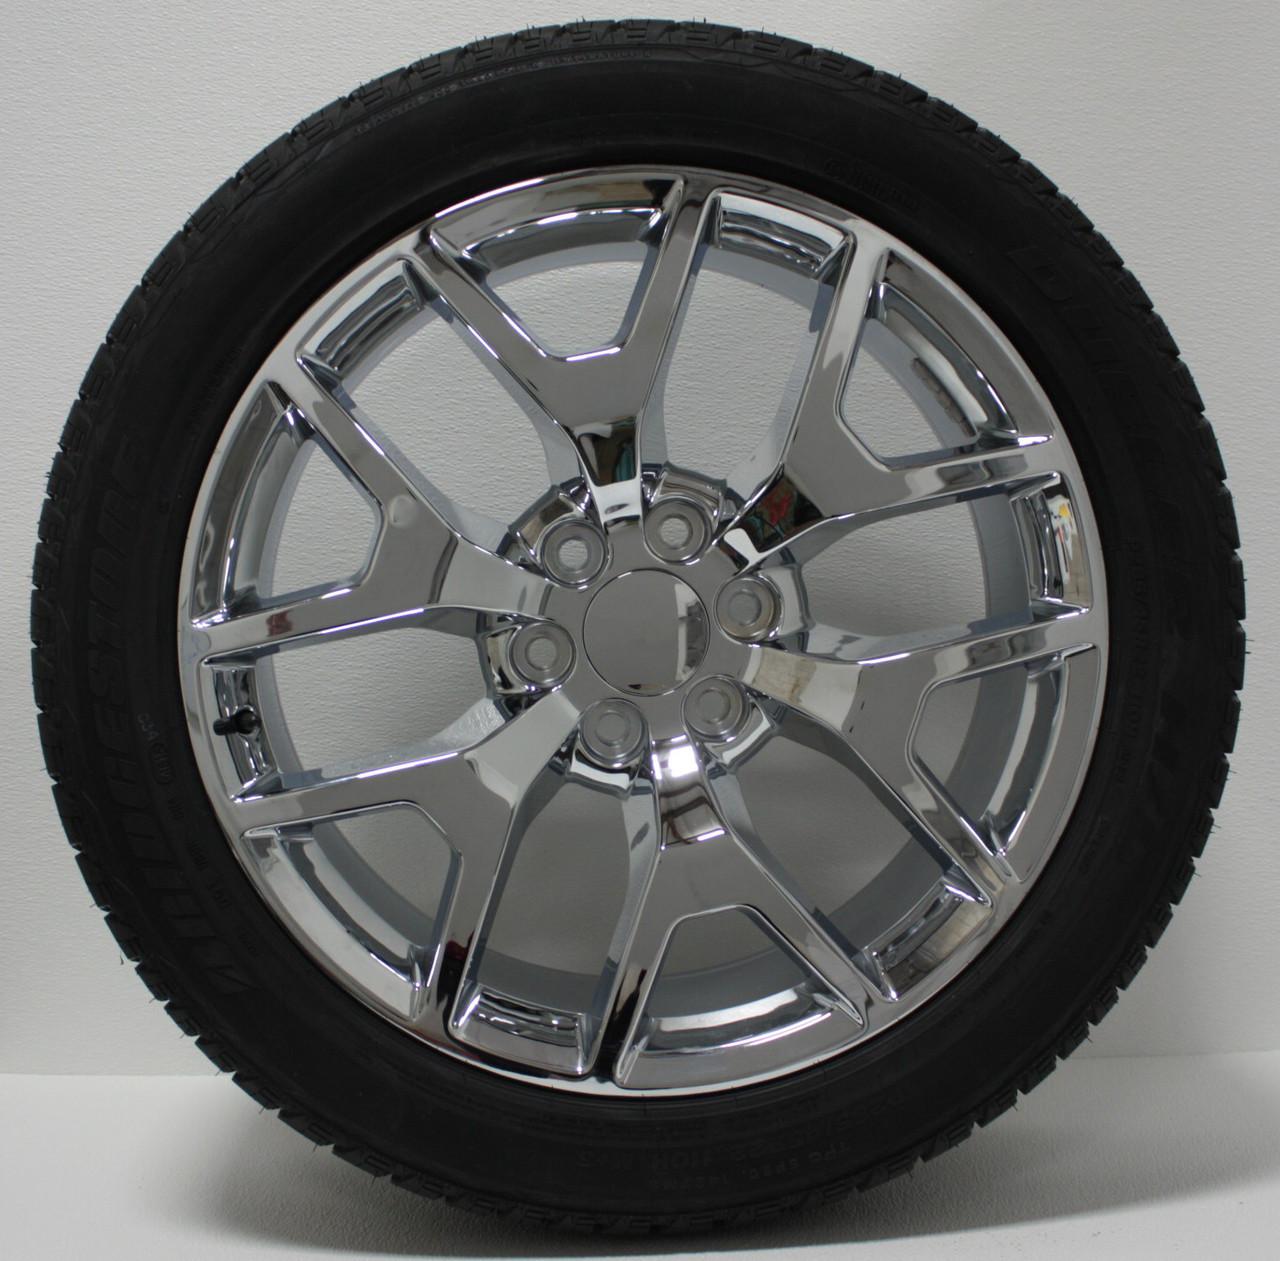 "Chrome 22"" Honeycomb Wheels with Bridgestone Tires for Chevy Silverado, Tahoe, Suburban - New Set of 4"